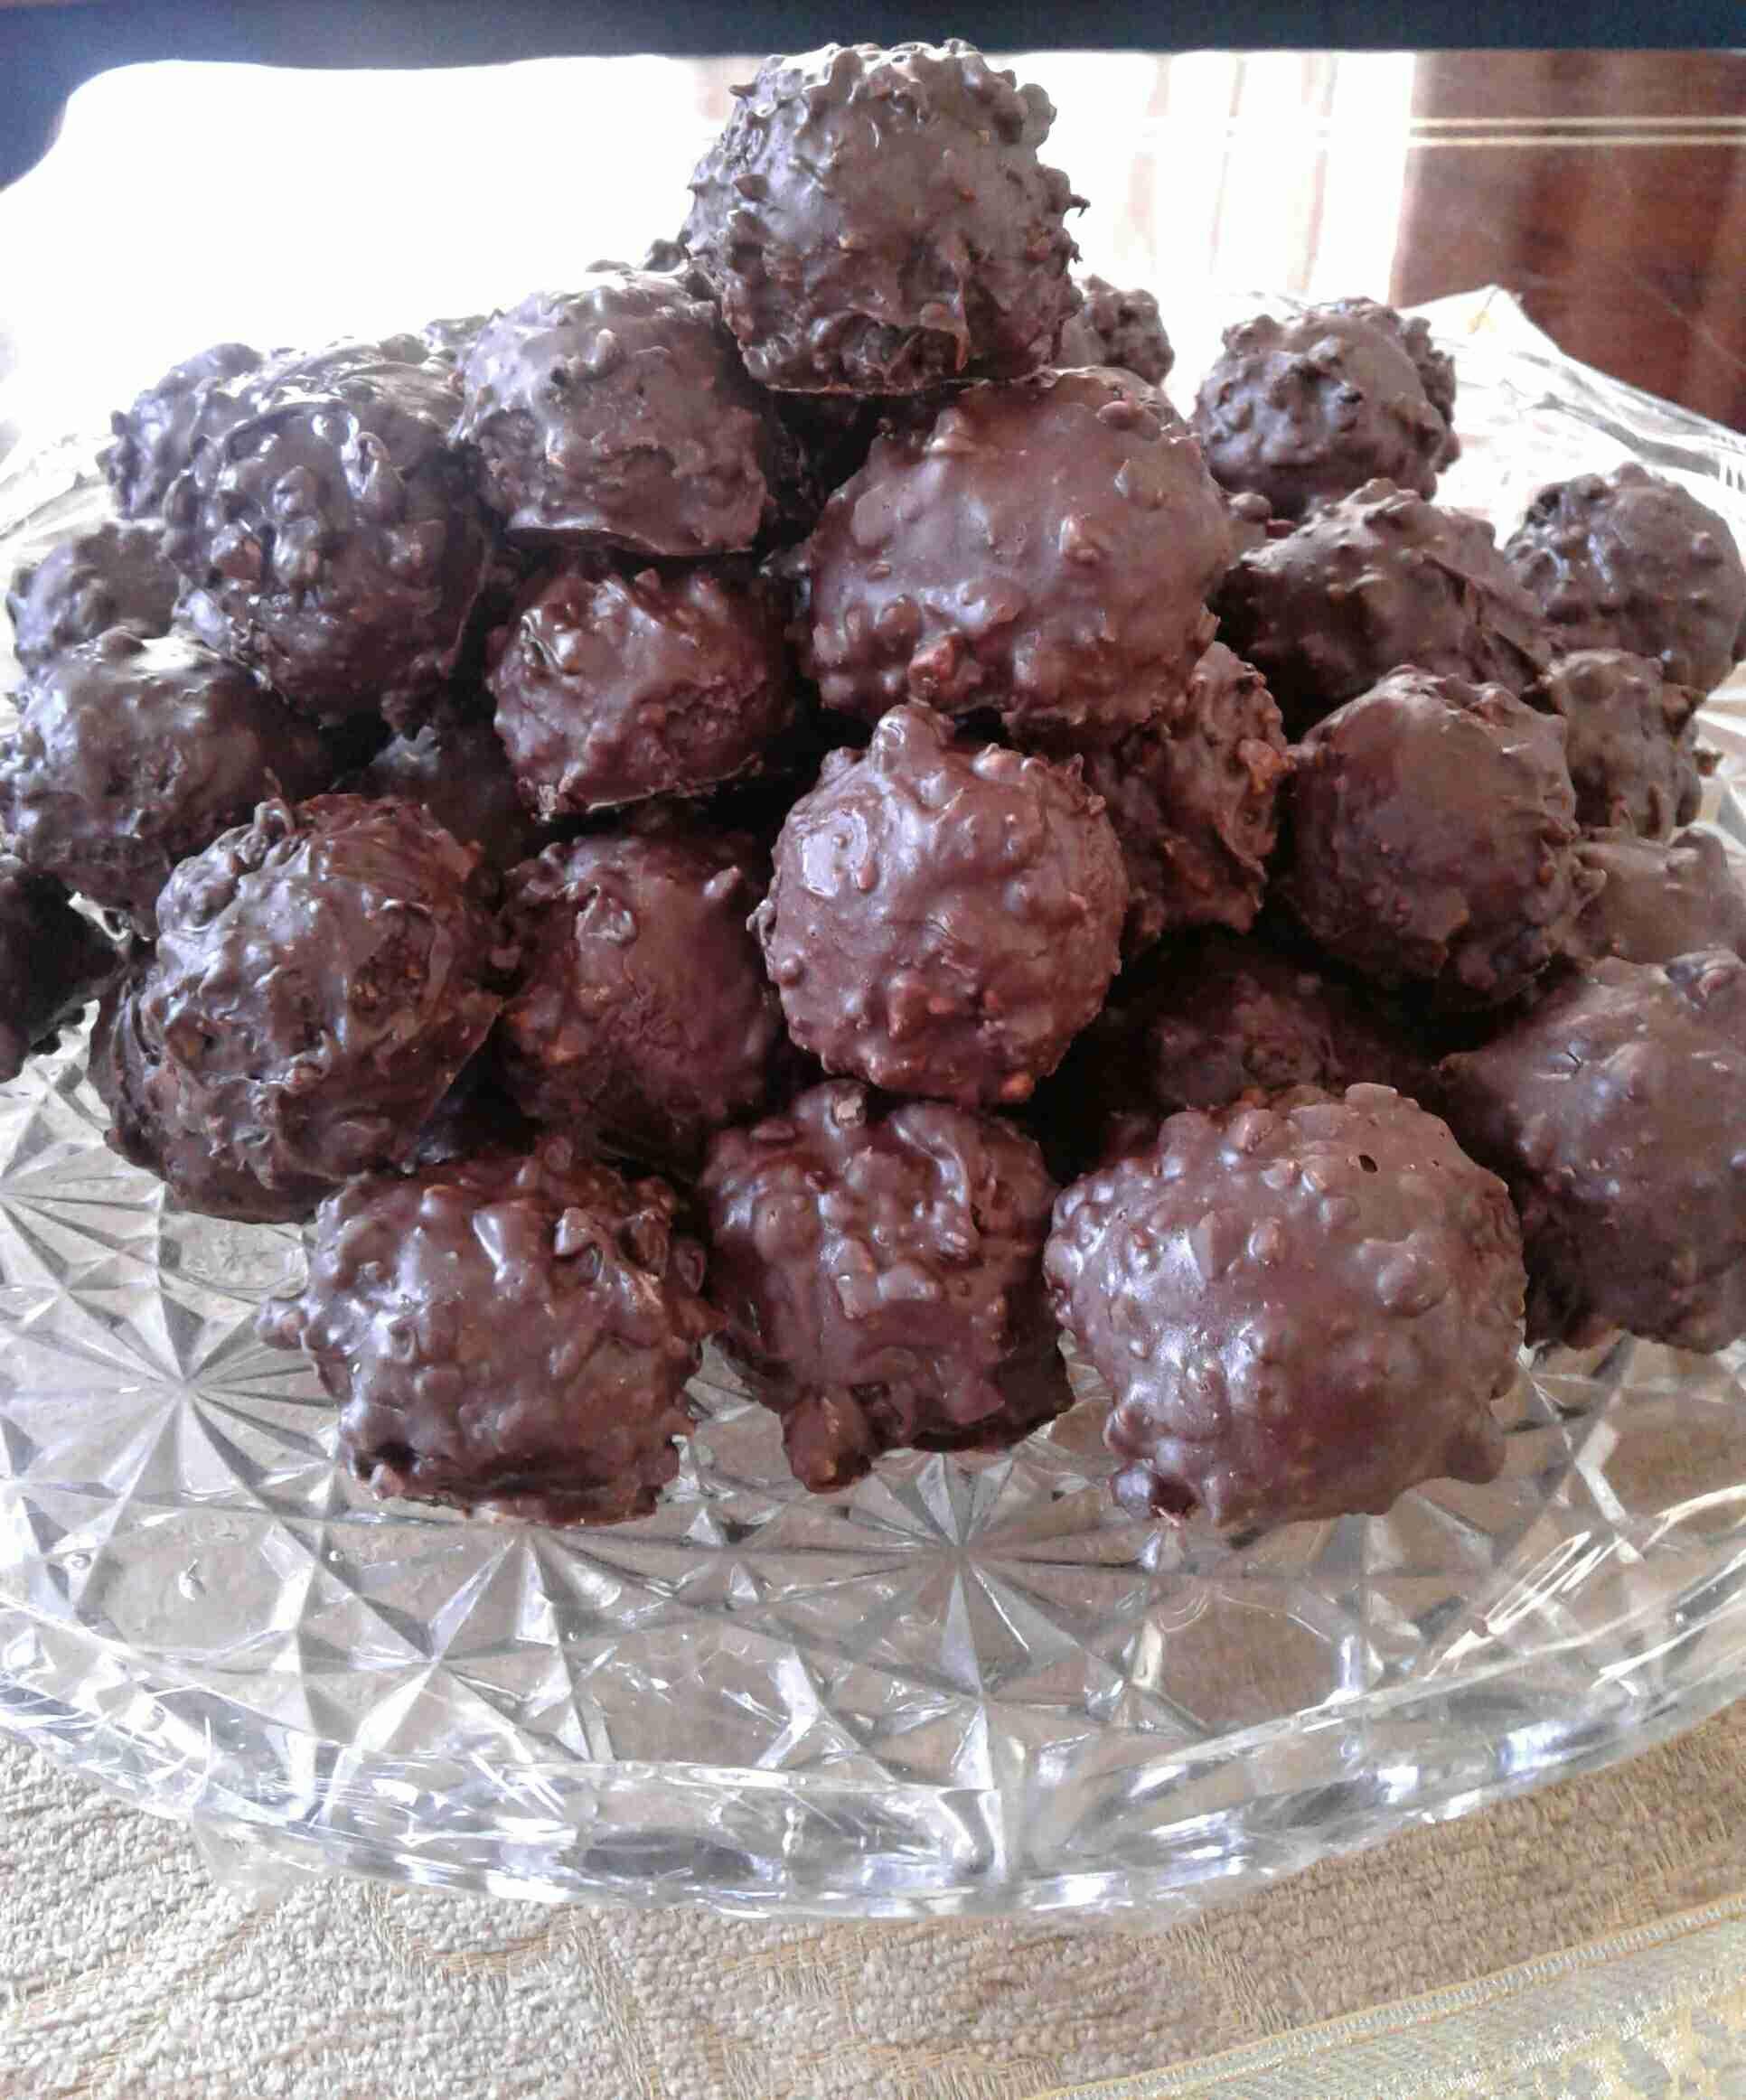 شوكولاته فيريرو روشيه المنزلية على طريقتي زاكي Recipe Middle Eastern Food Desserts Middle East Recipes Food